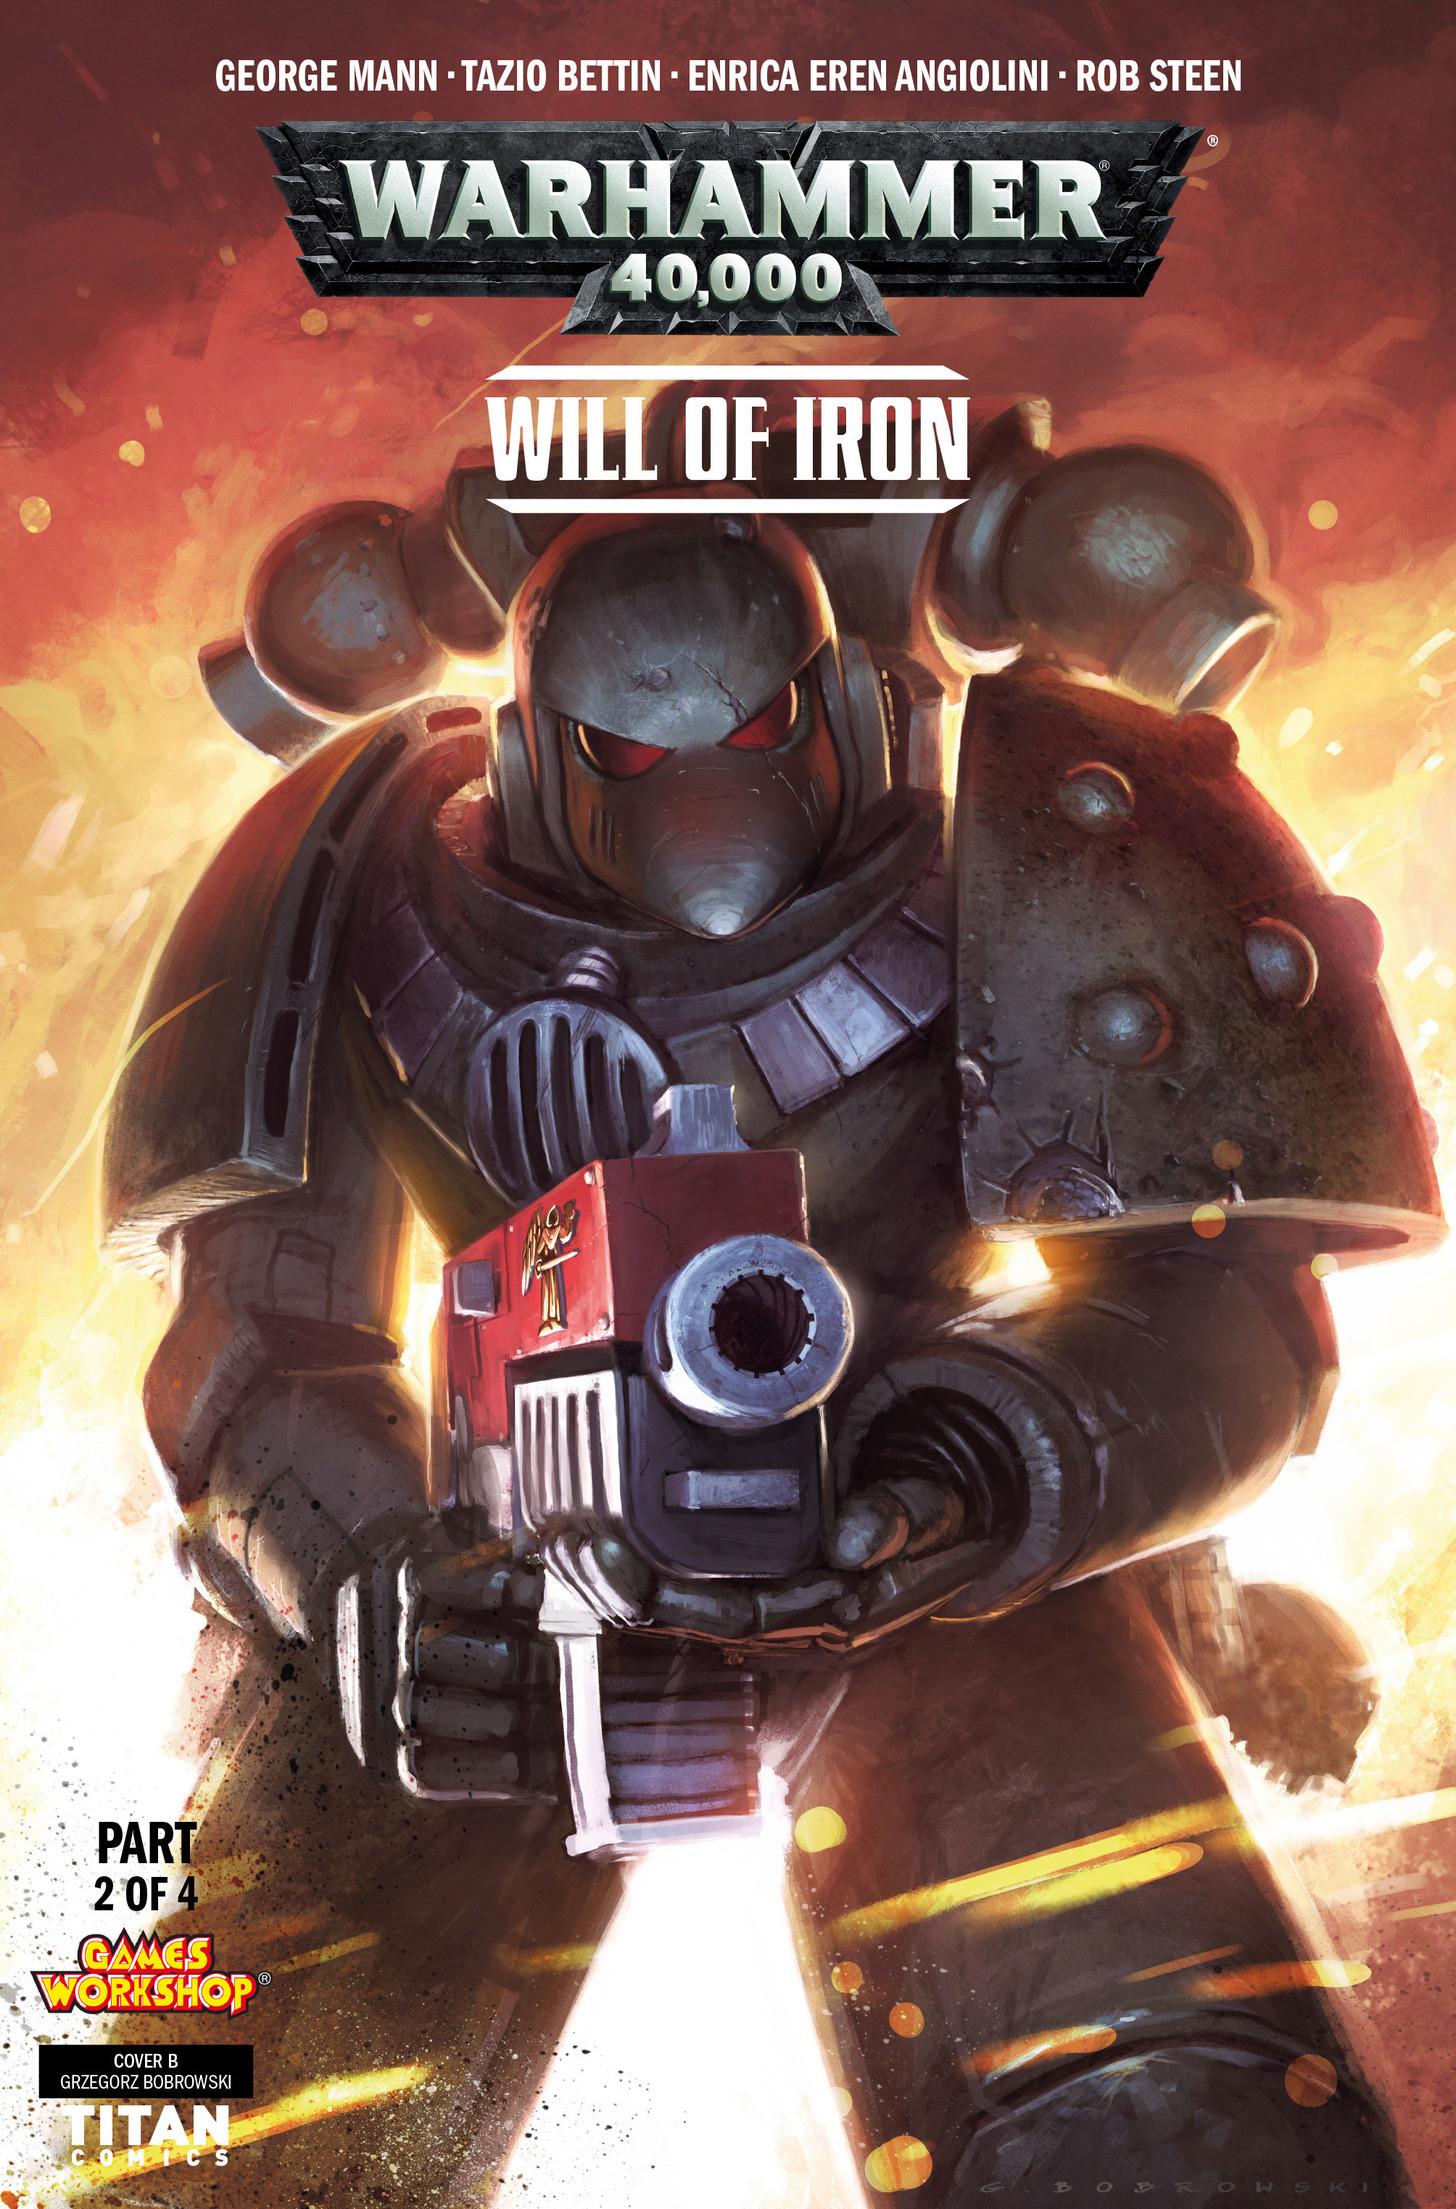 Greg bobrowski will of iron pt2